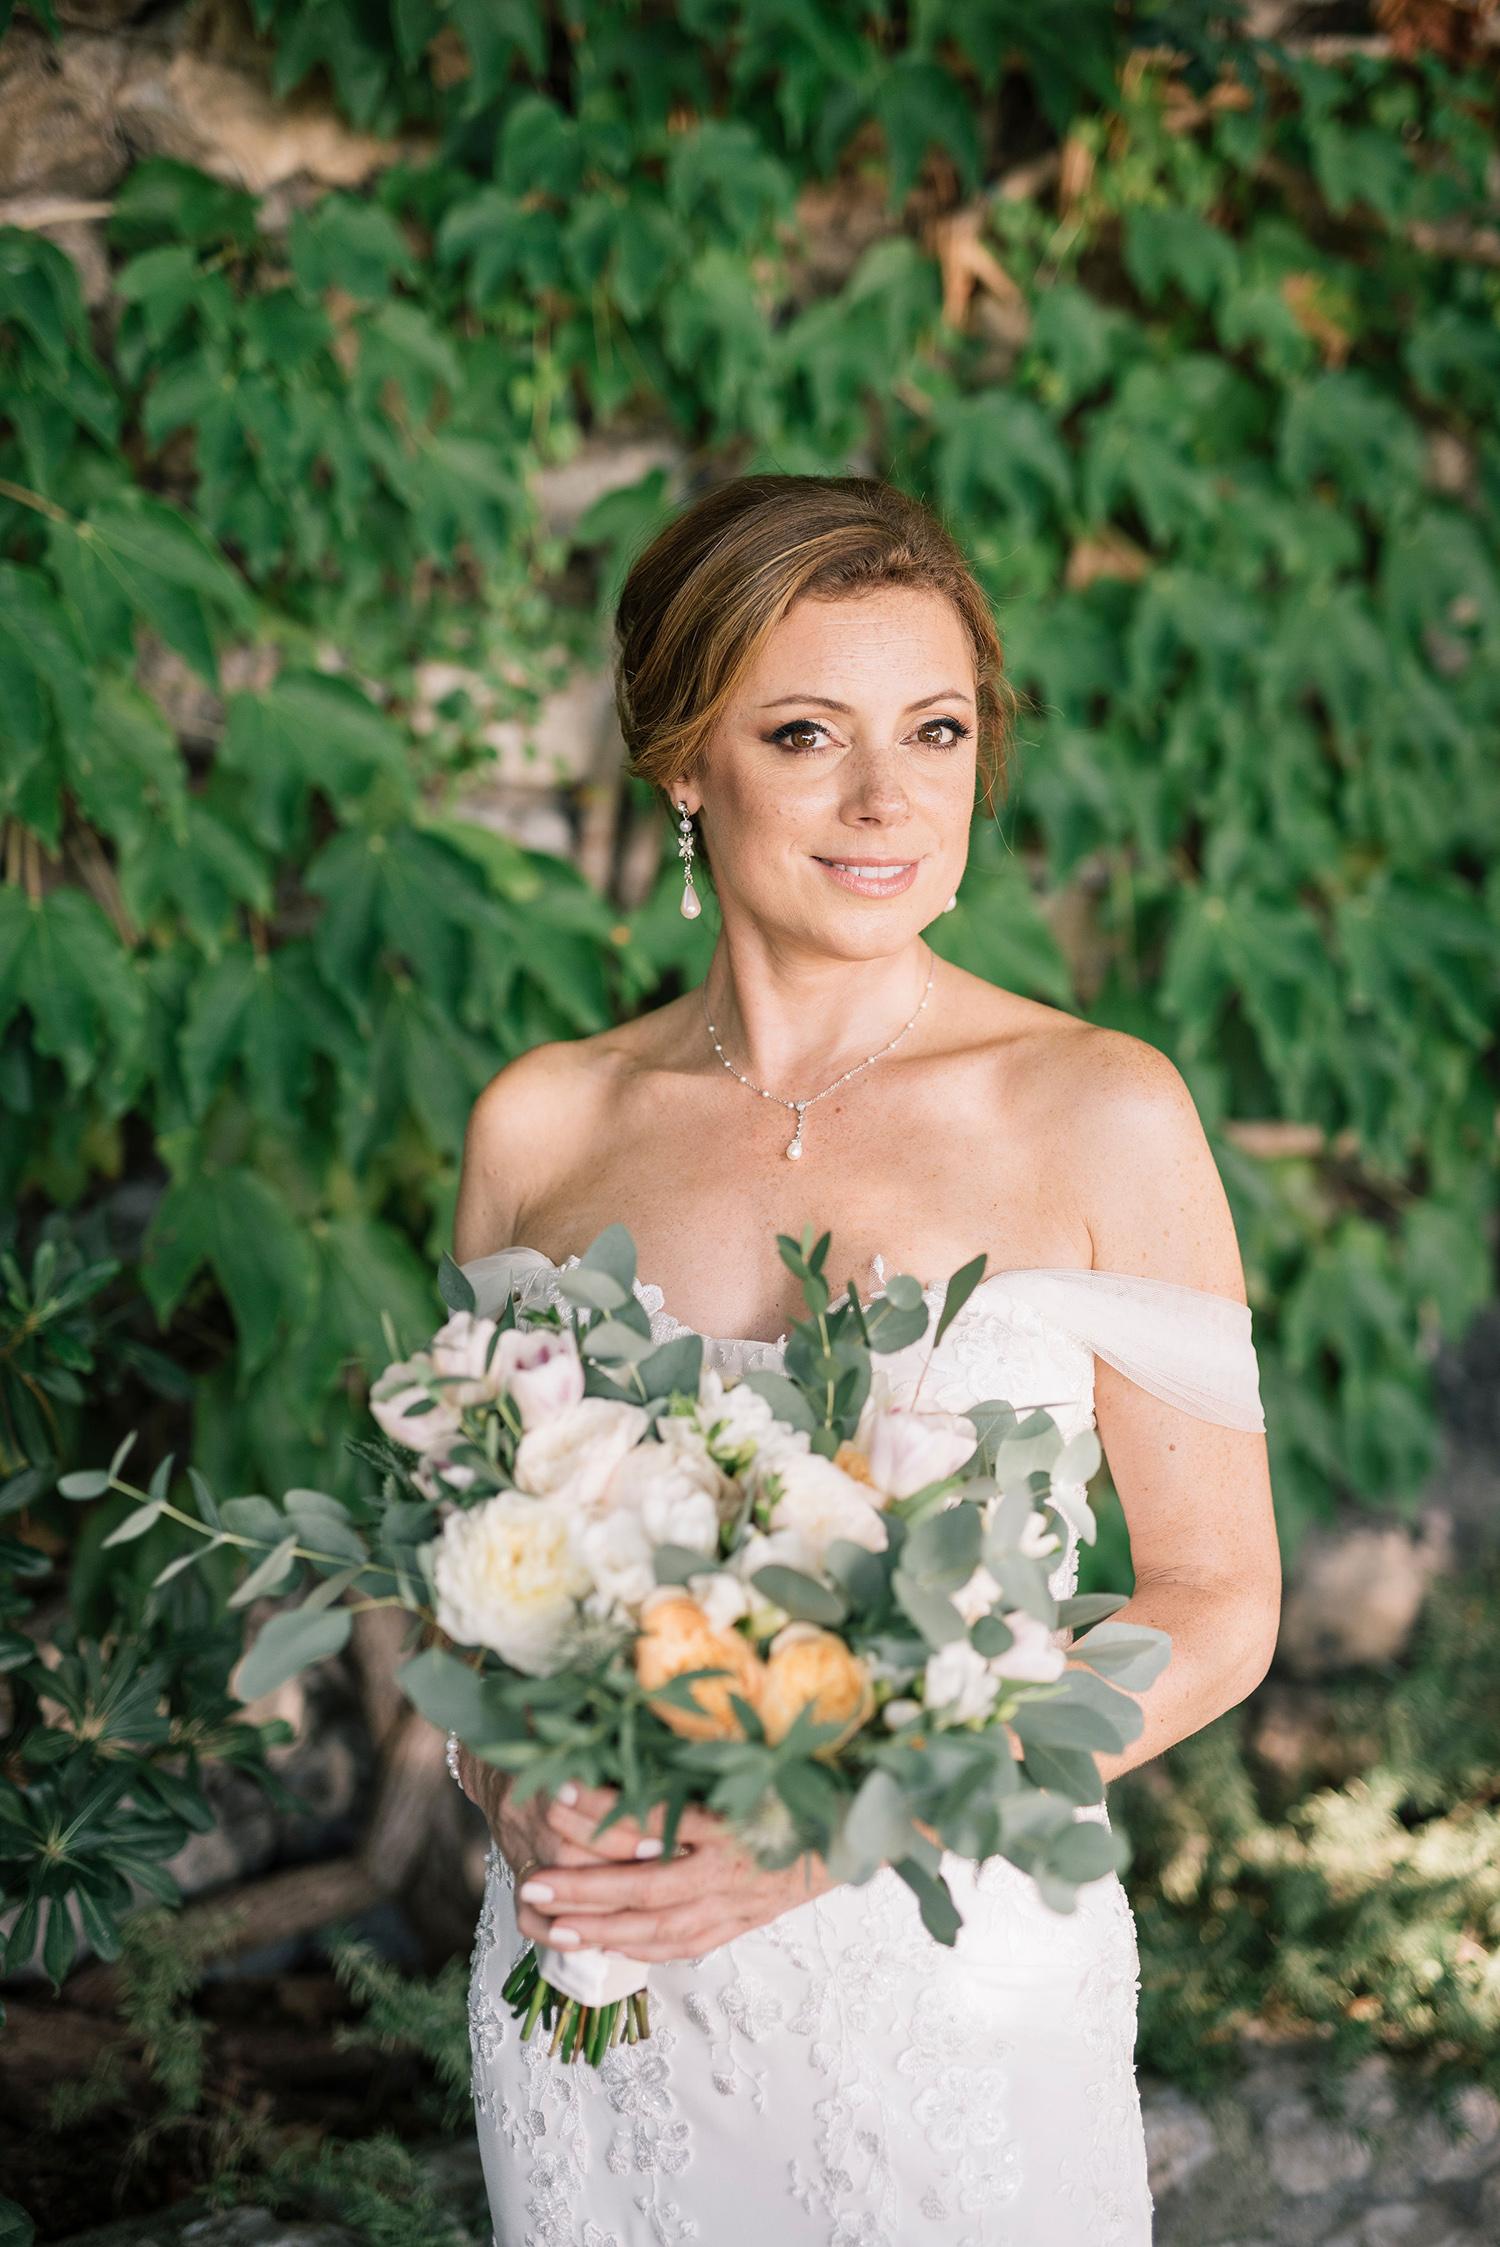 cara david wedding bride in front of greenery